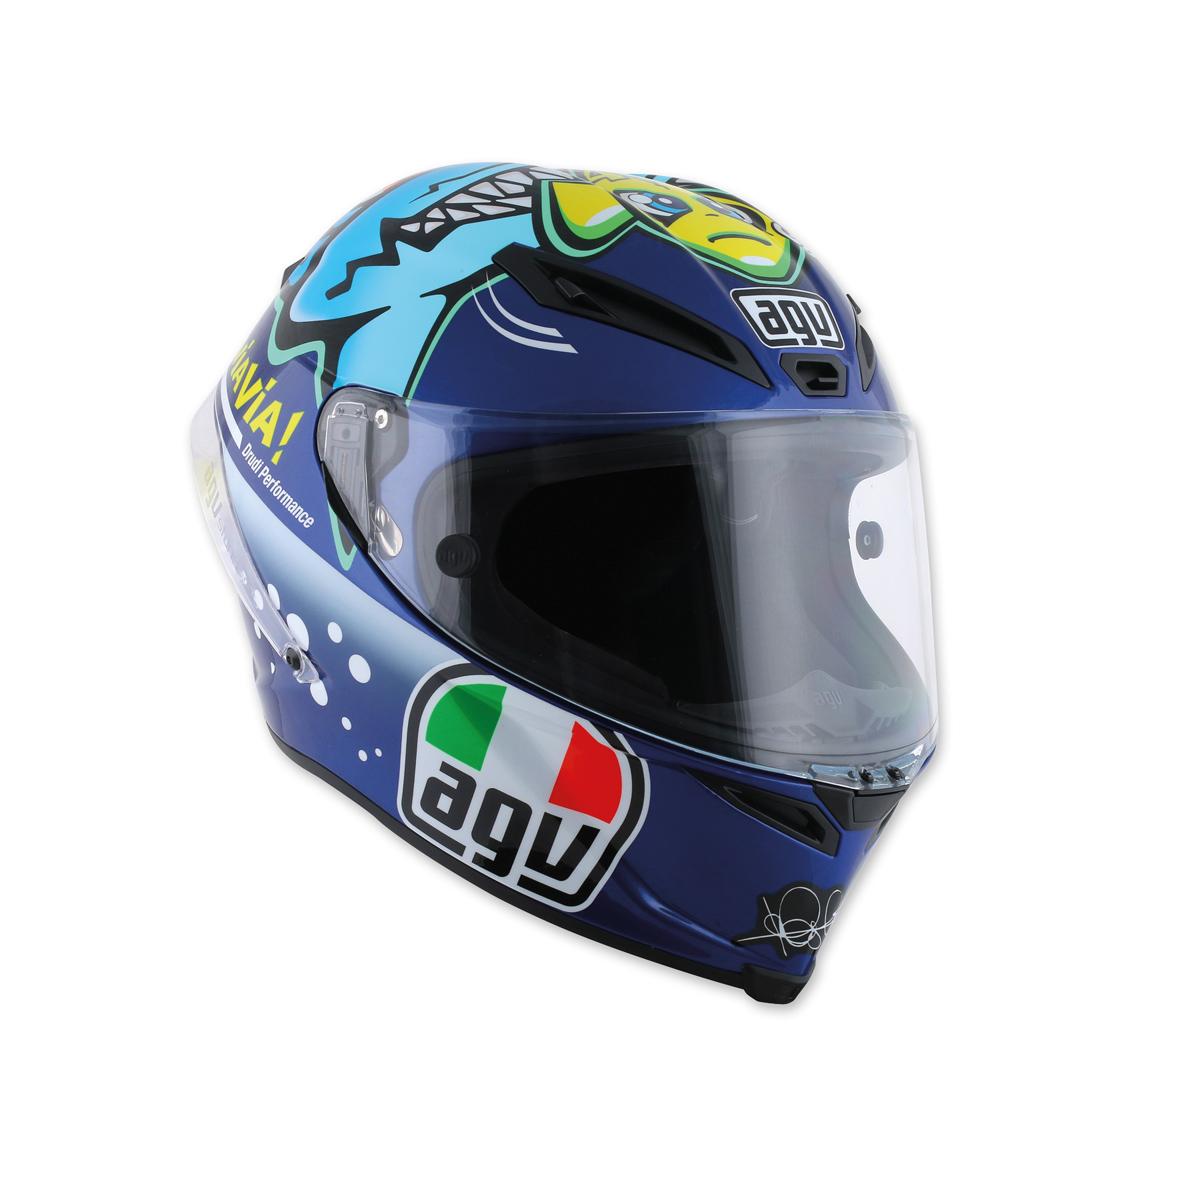 AGV Pista GP R Rossi Misano Full Face Helmet